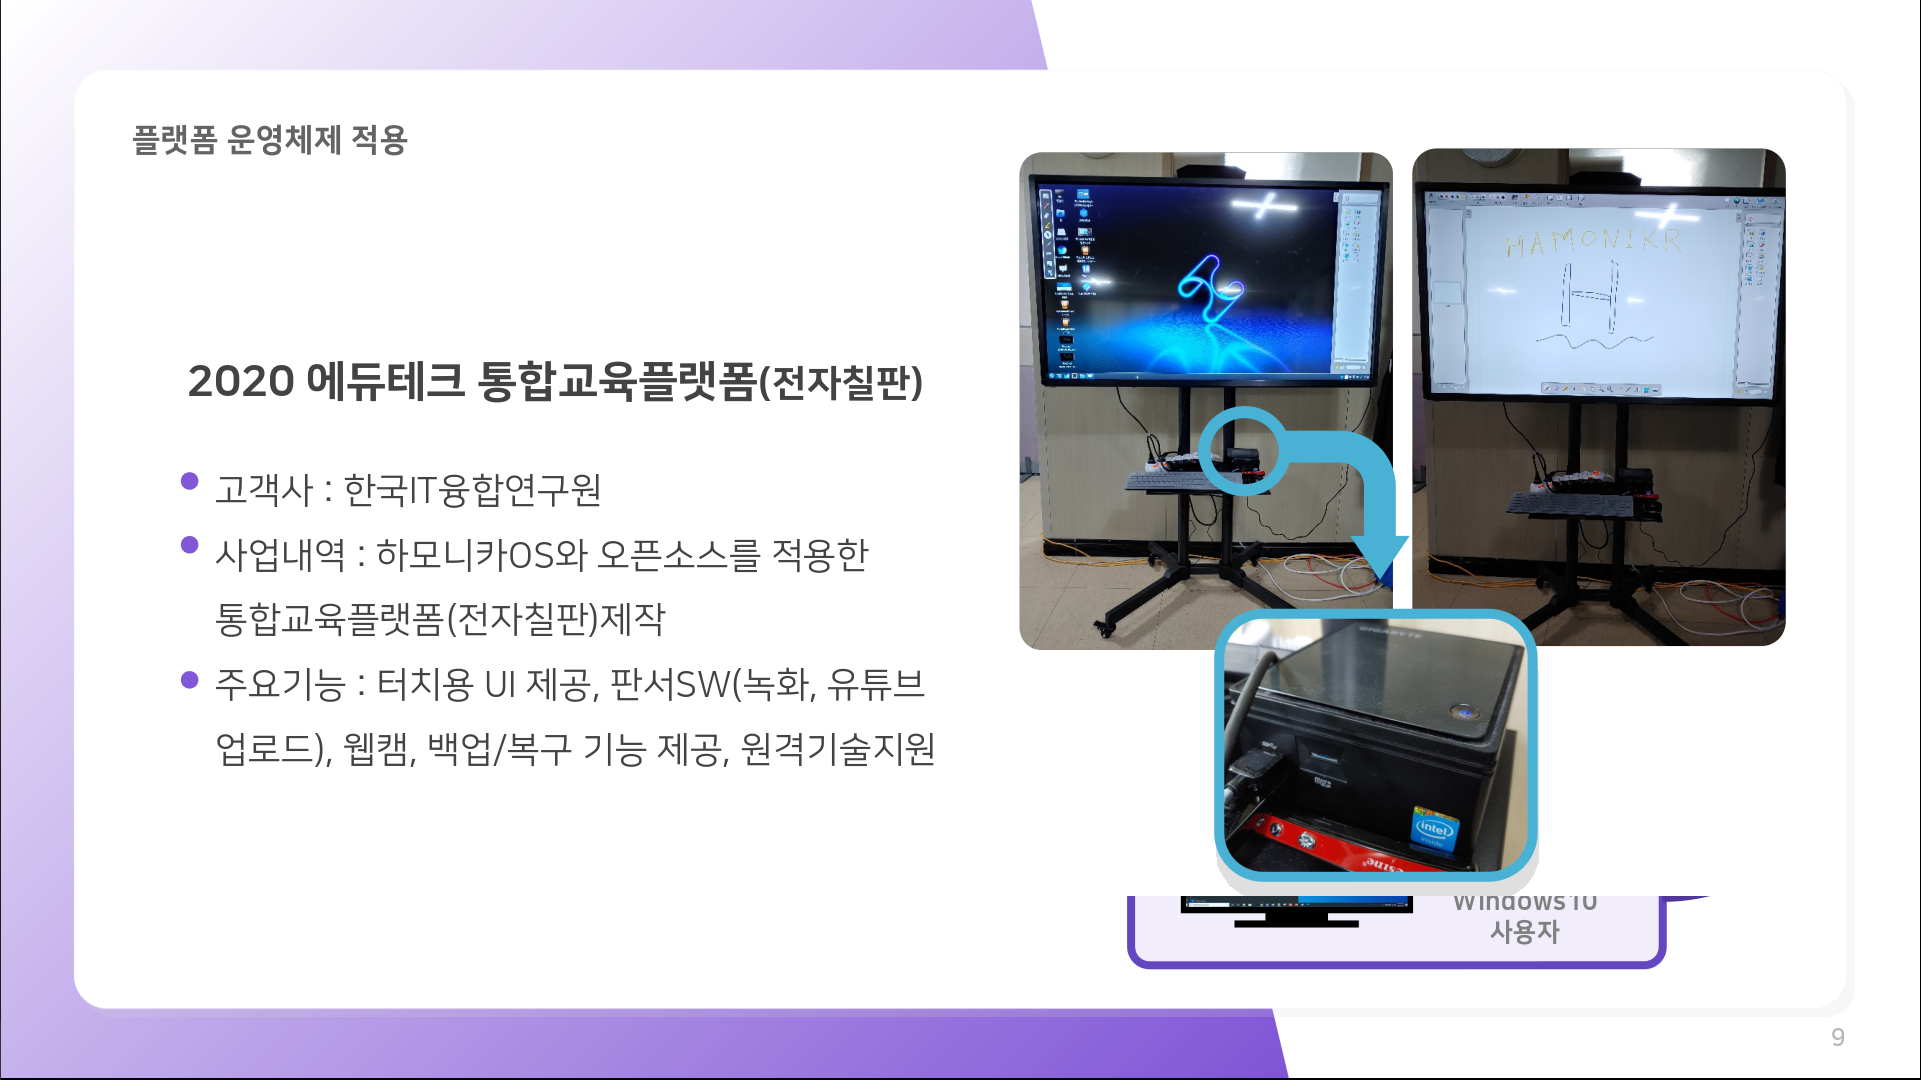 Presenting: 하모니카-도입실적현황-20210126_3_720.png